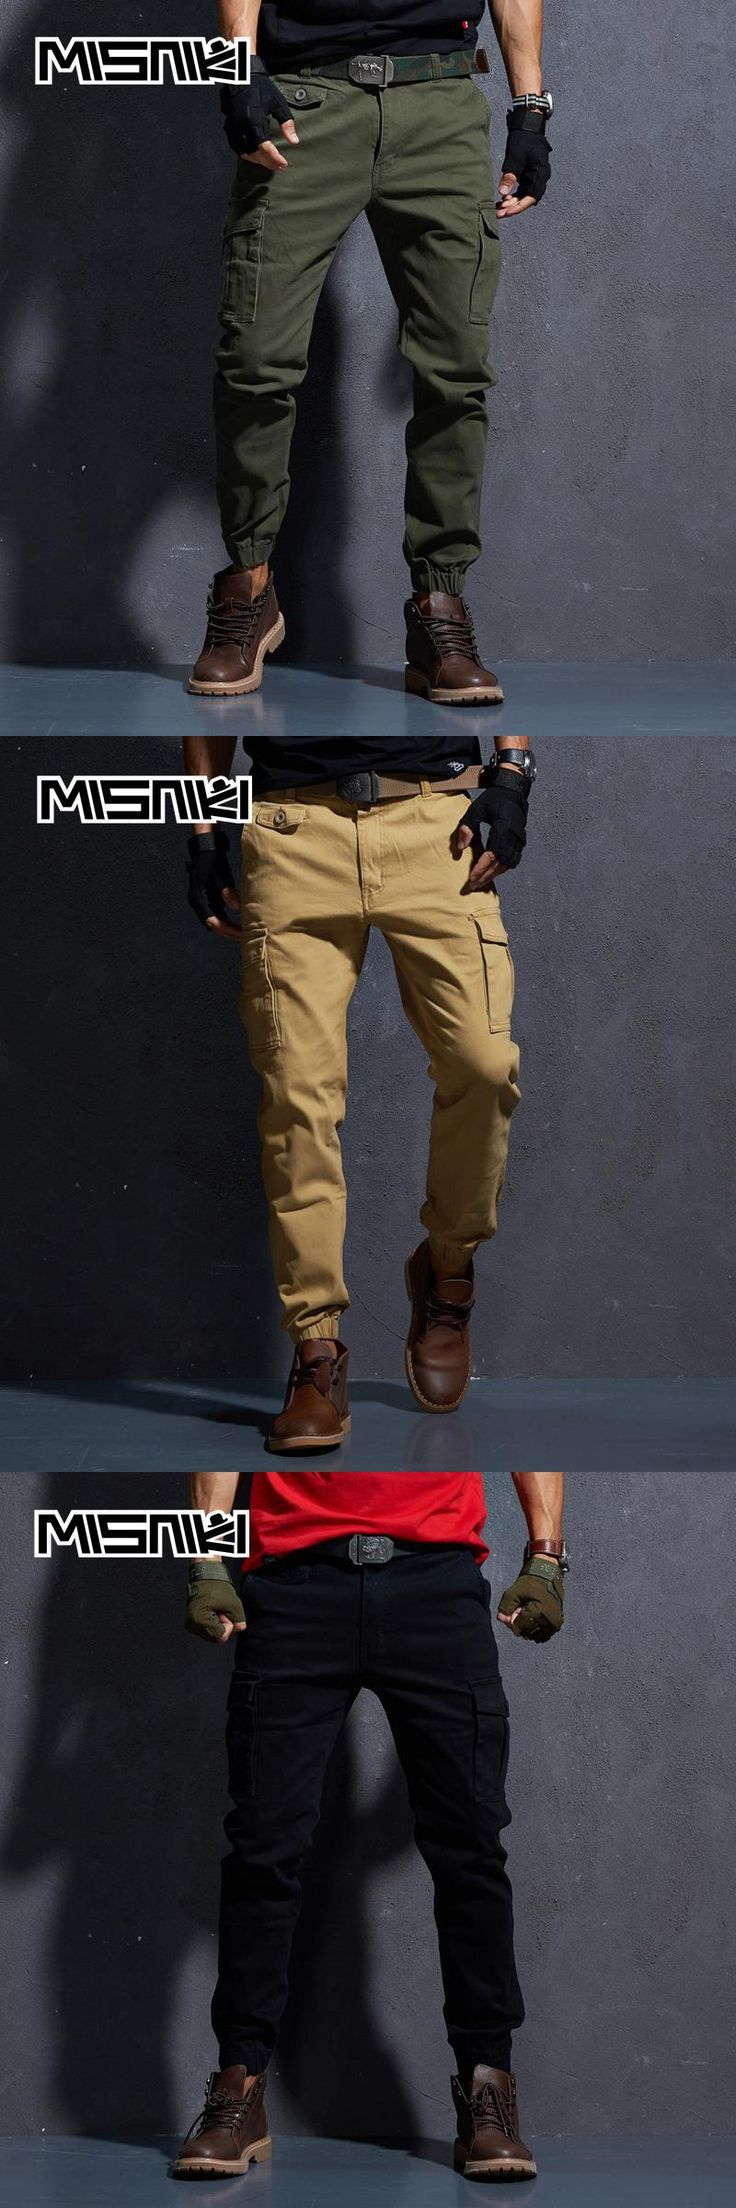 MISNIKI 2018 New Fashion Urban Tactical Pants Mens Cotton Casual Cargo Trousers Men Pantalon Hombre